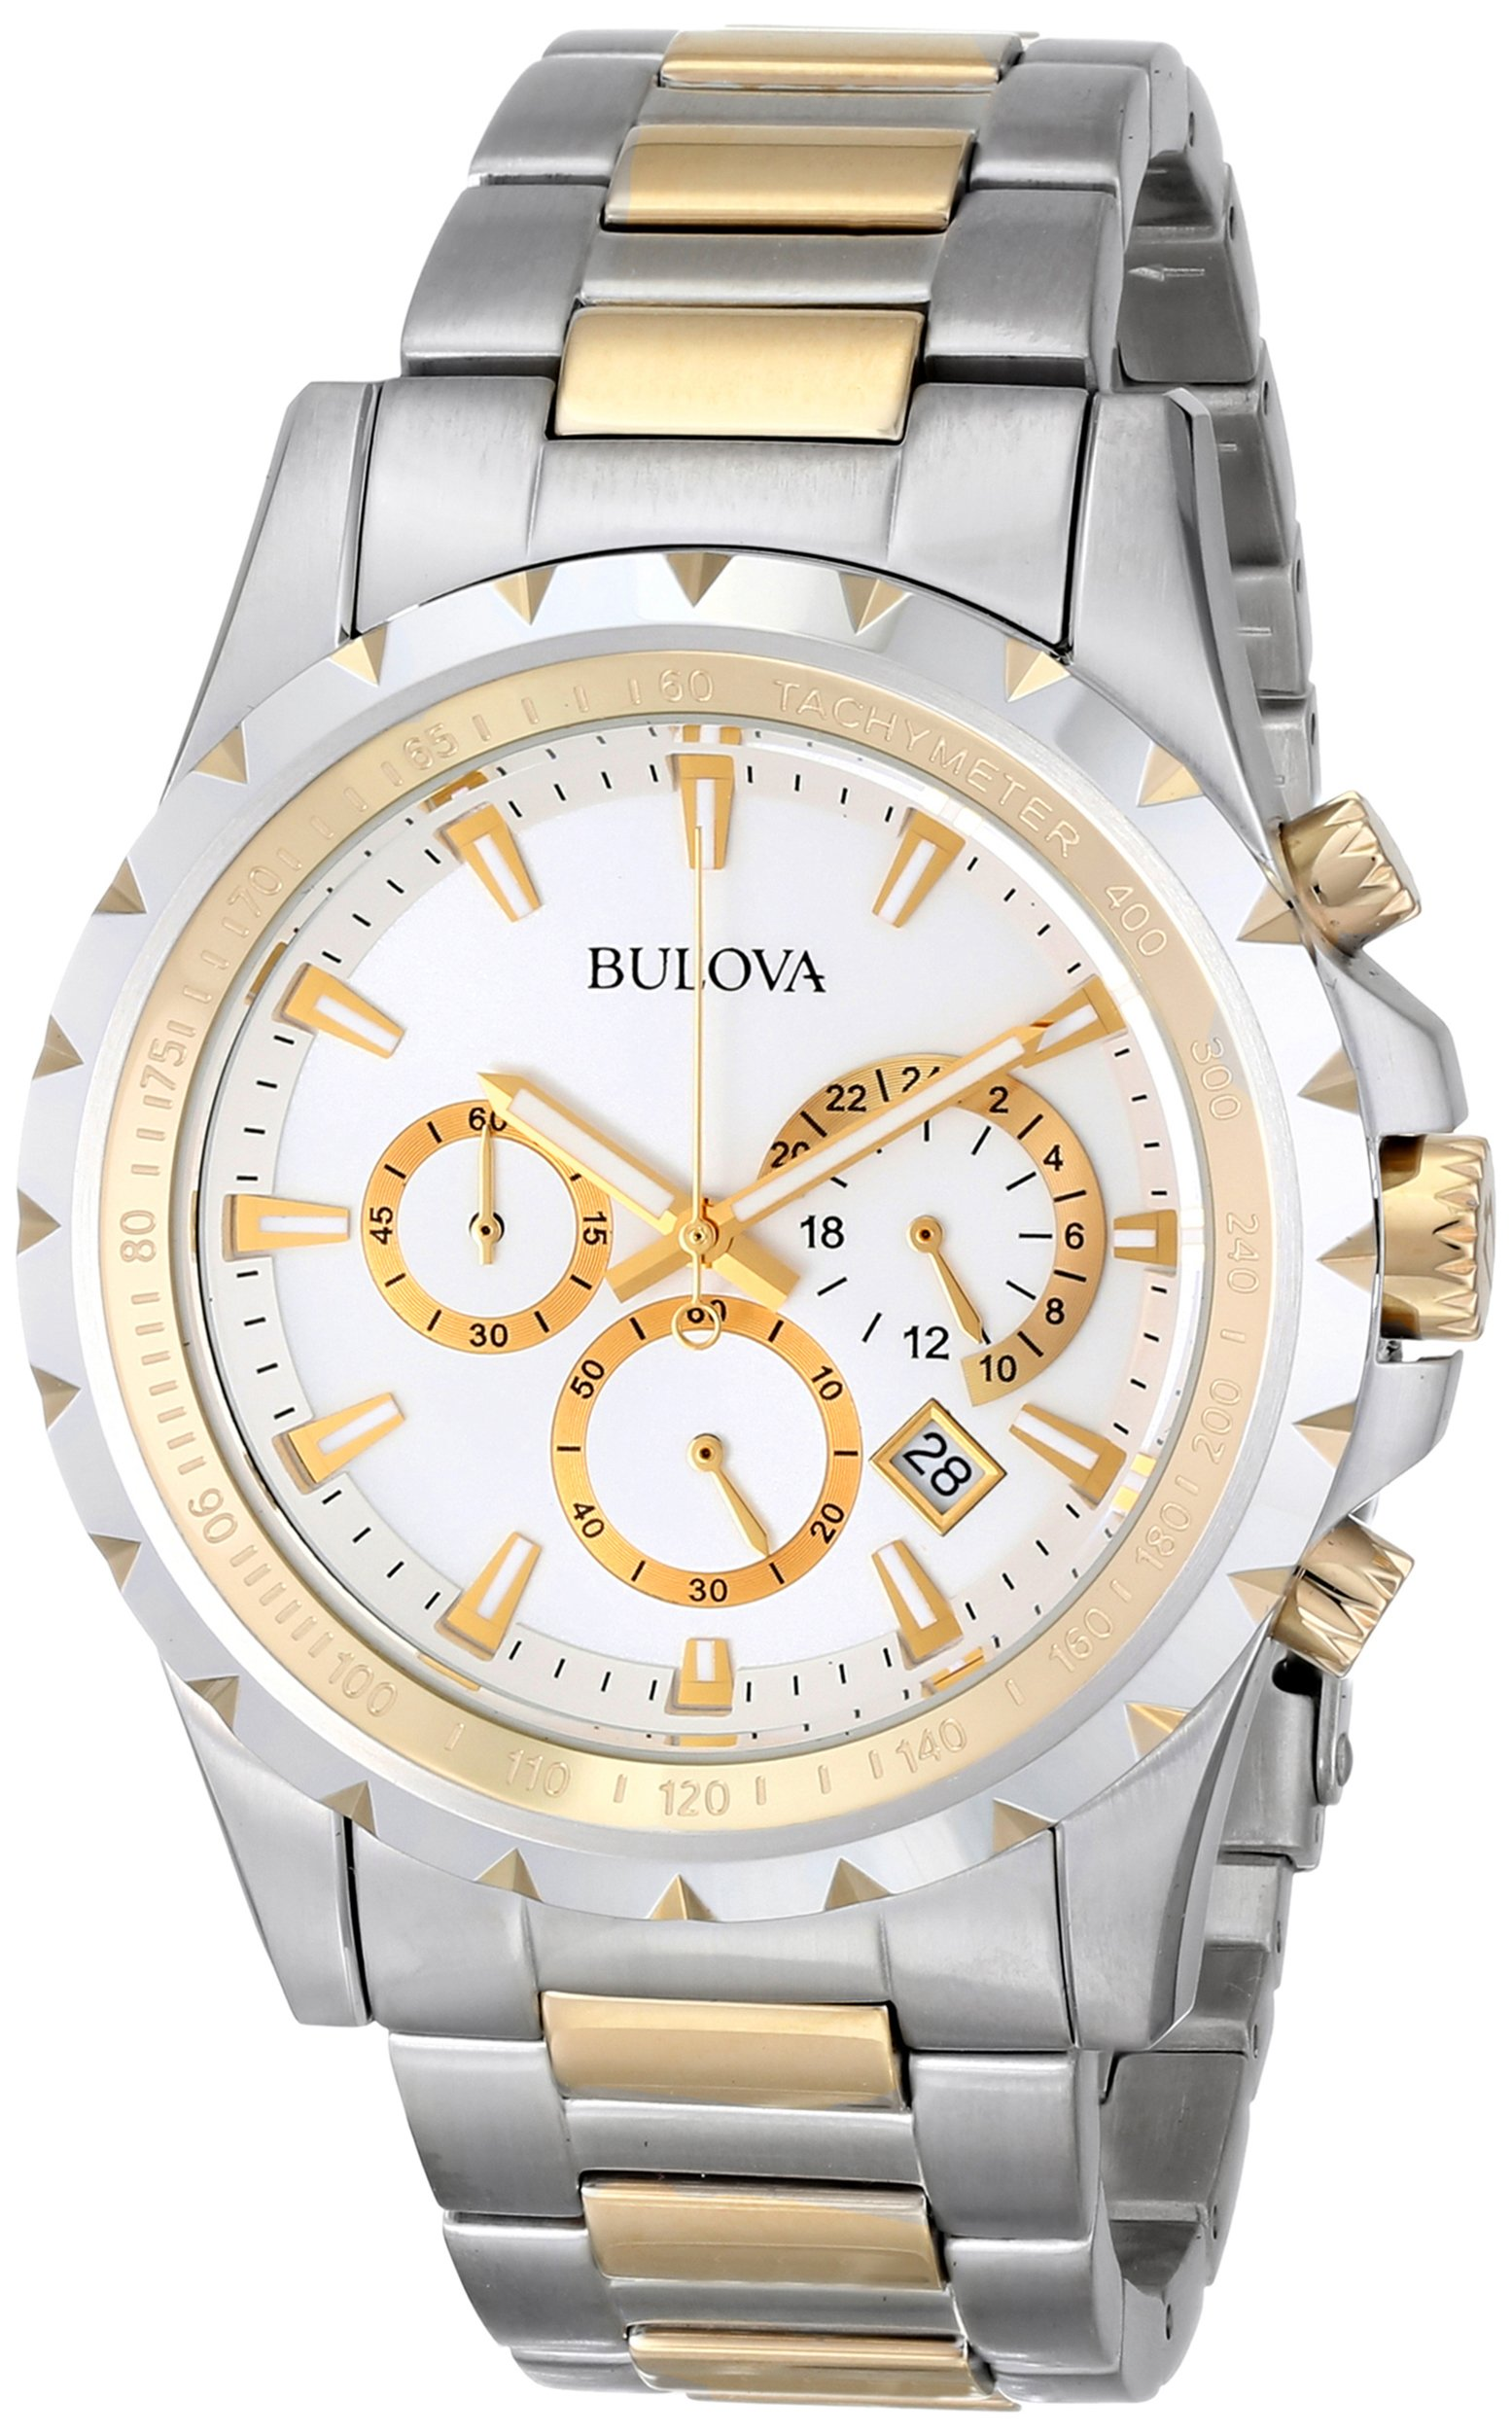 Bulova Men's 98B014 Marine Star Stainless Steel Chronograph Watch